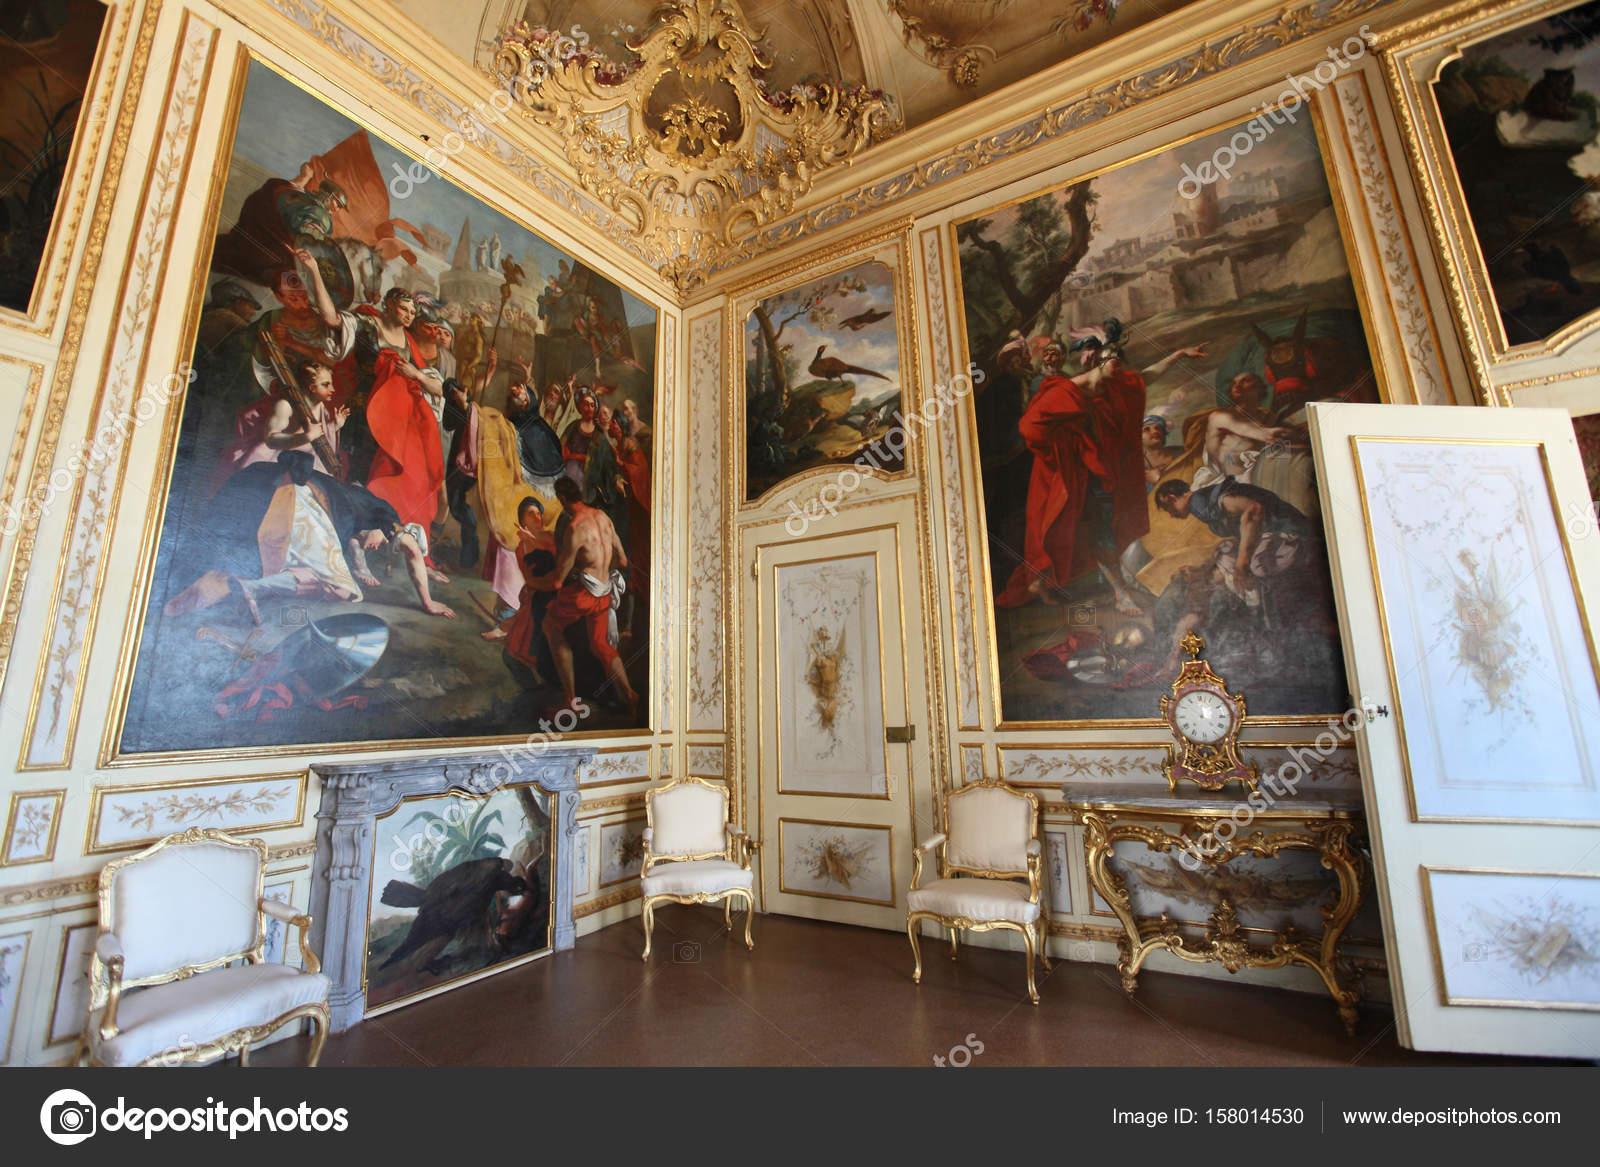 Interni Di Villa Pisani : Interni di villa pisani u2014 foto editoriale stock © ohmaymay #158014530